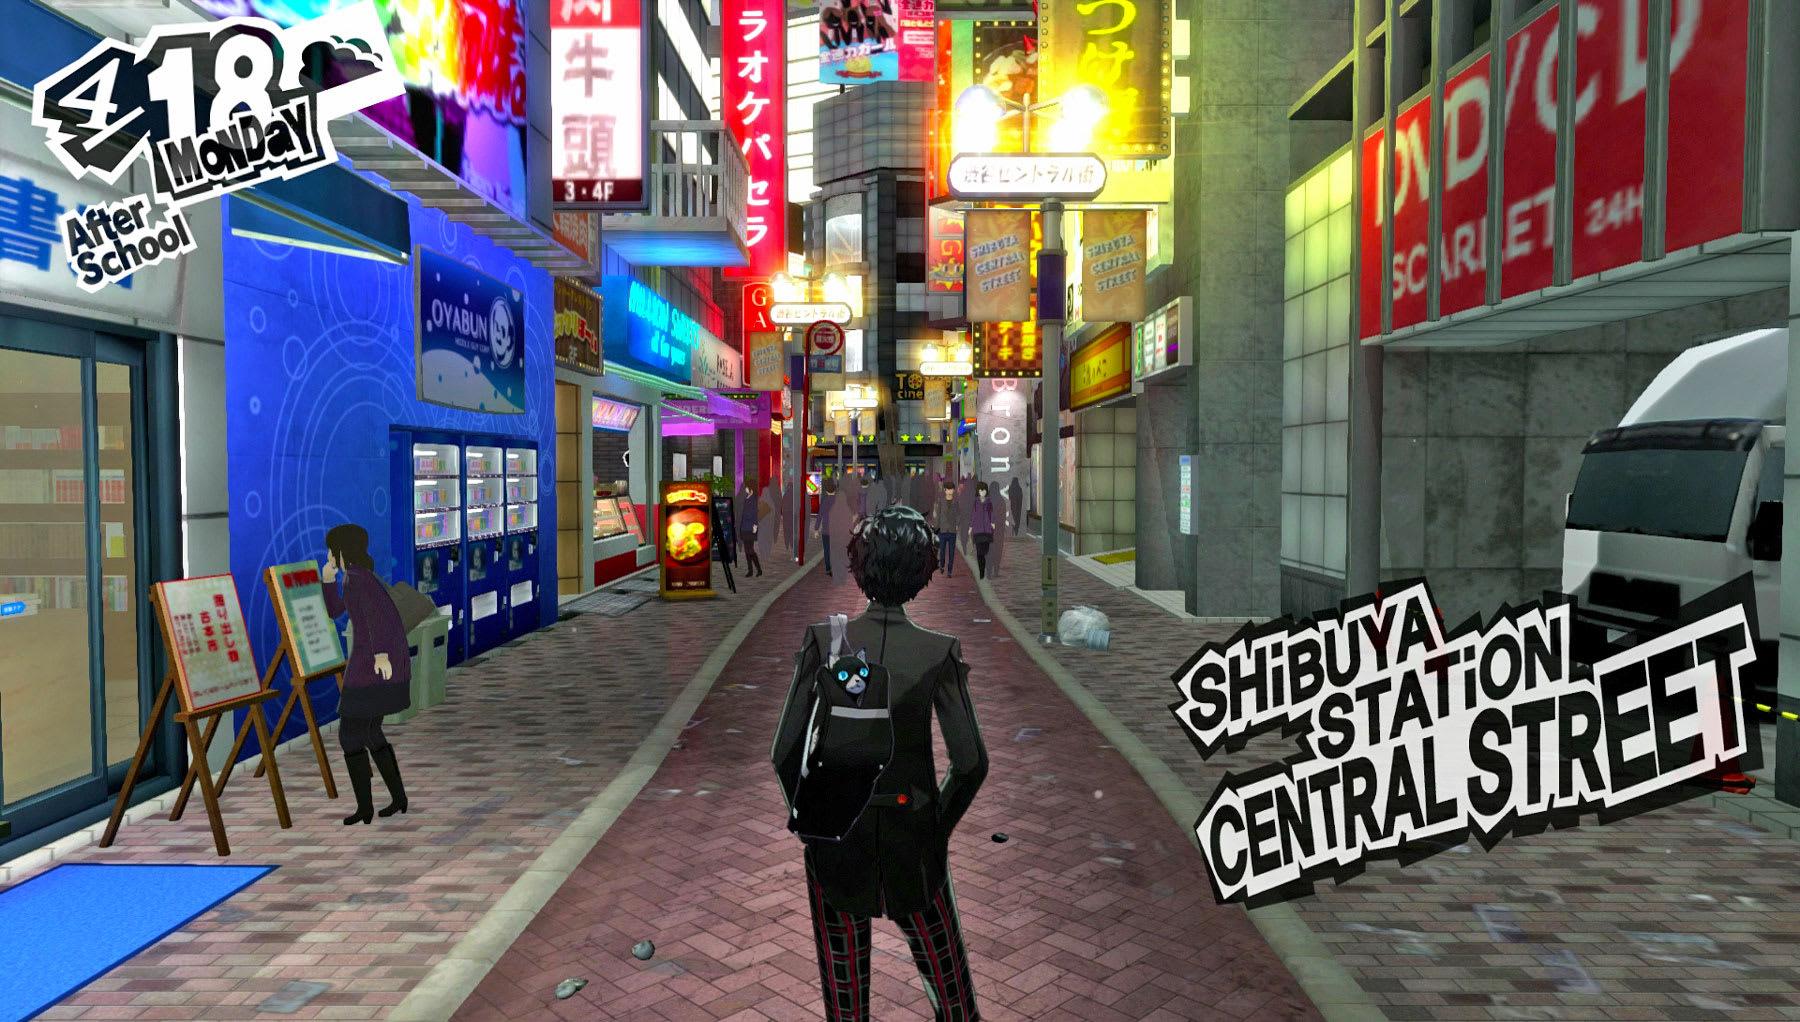 Persona 5' took me back to Tokyo